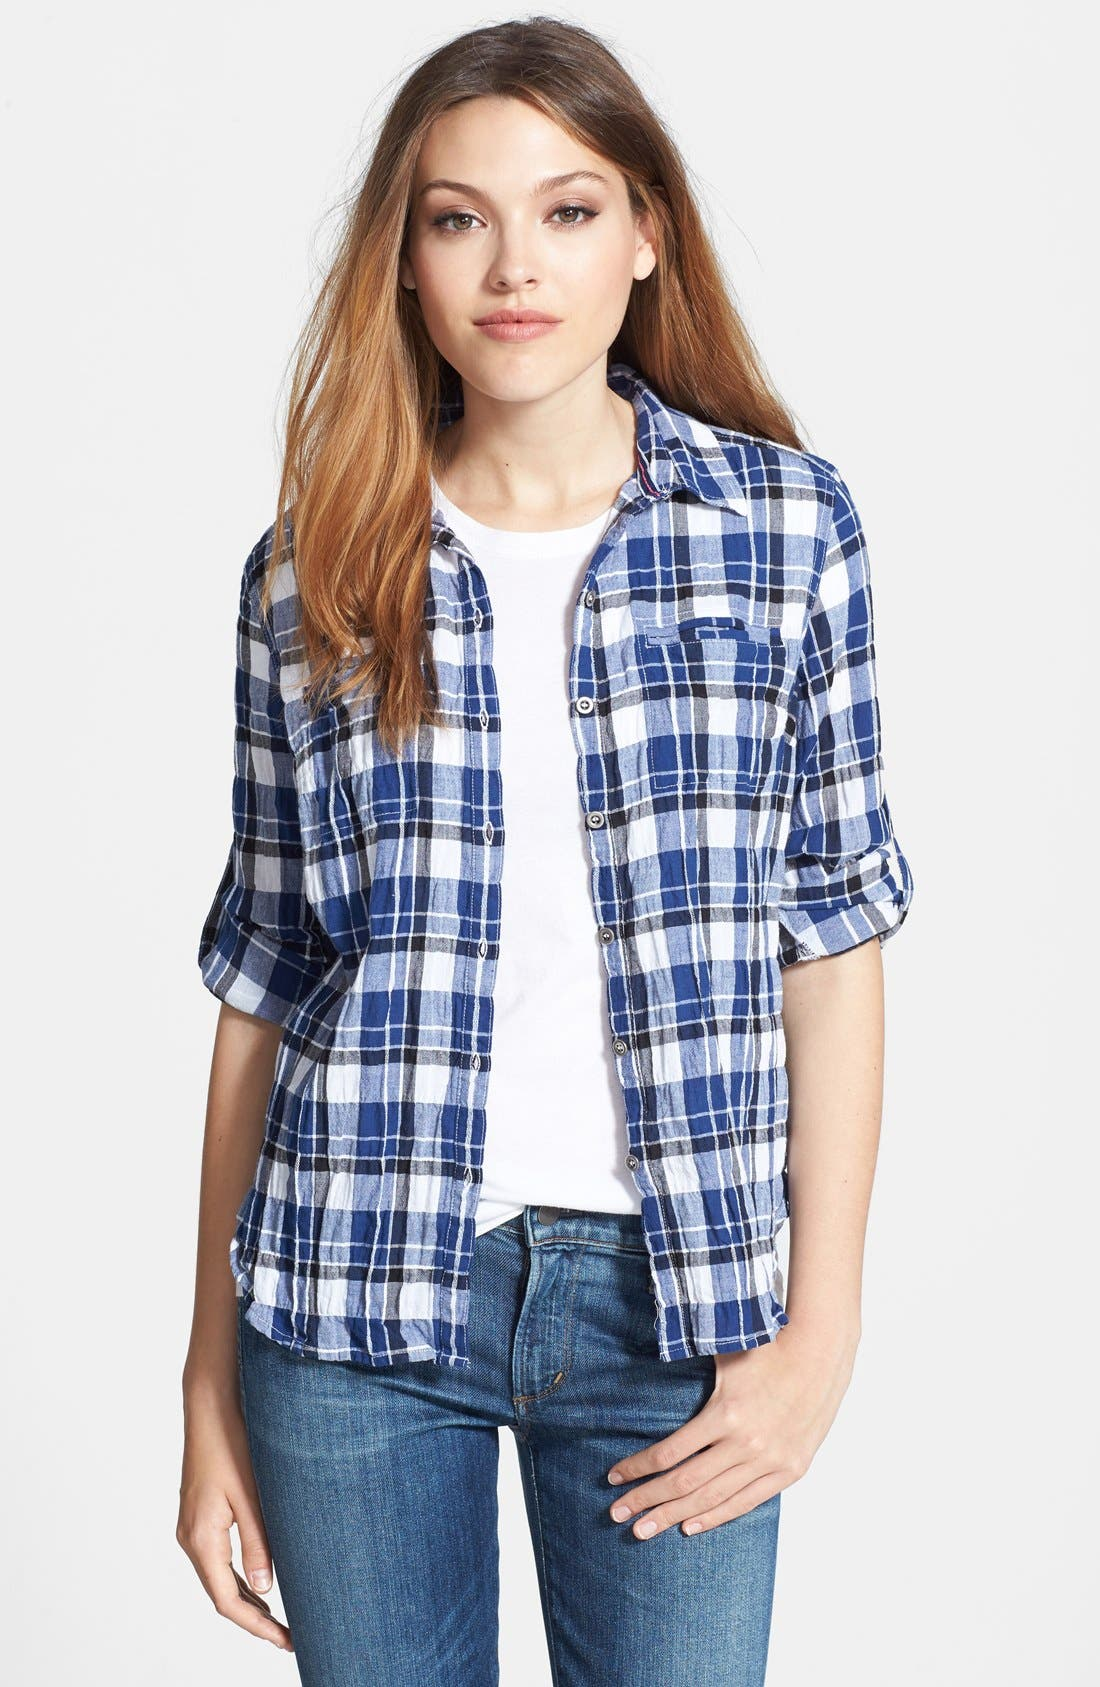 Alternate Image 1 Selected - Sandra Ingrish Plaid Roll Sleeve Cotton Shirt (Regular & Petite)